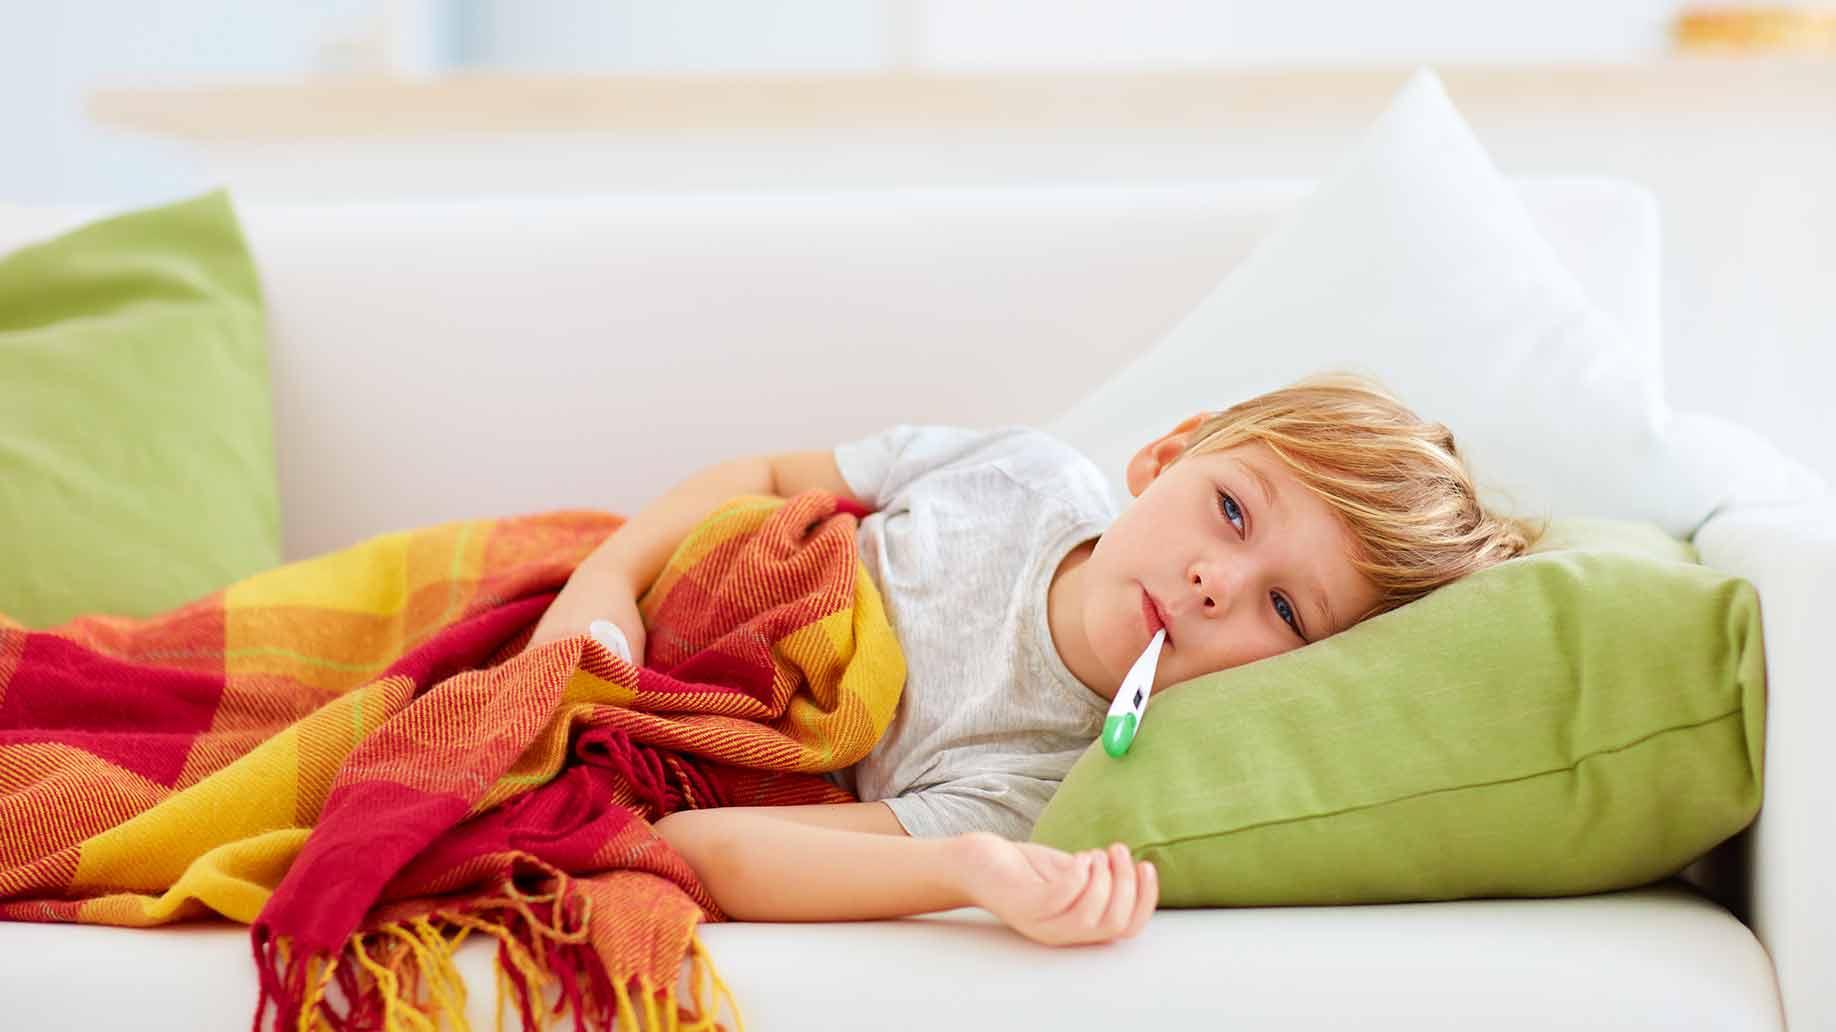 common cold sick vitamin c health benefit cough fever runny nose